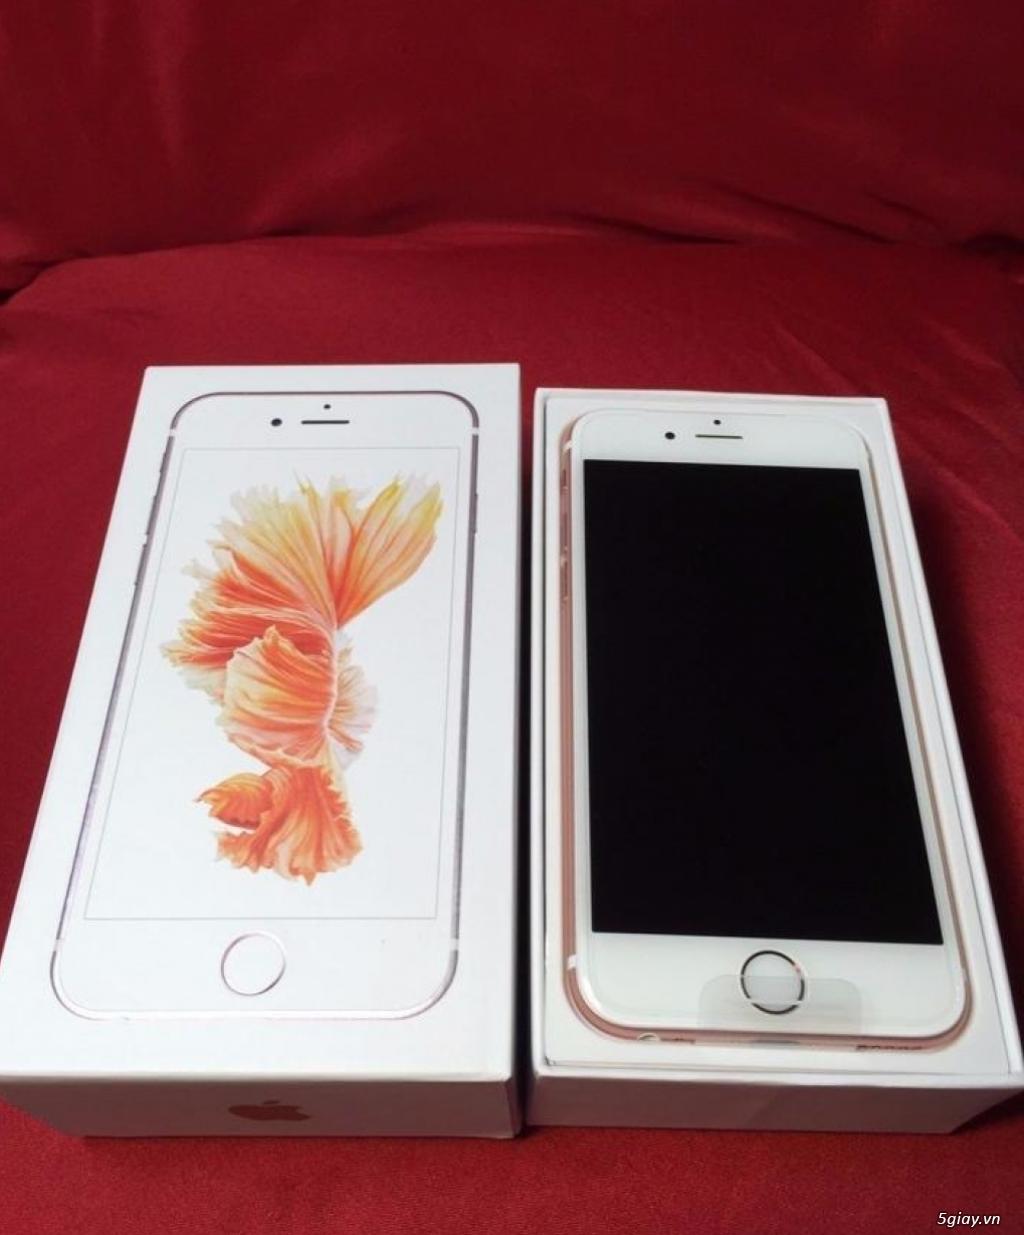 Iphone 6s Plus Gold Rose 128G USA (Mỹ) - 1